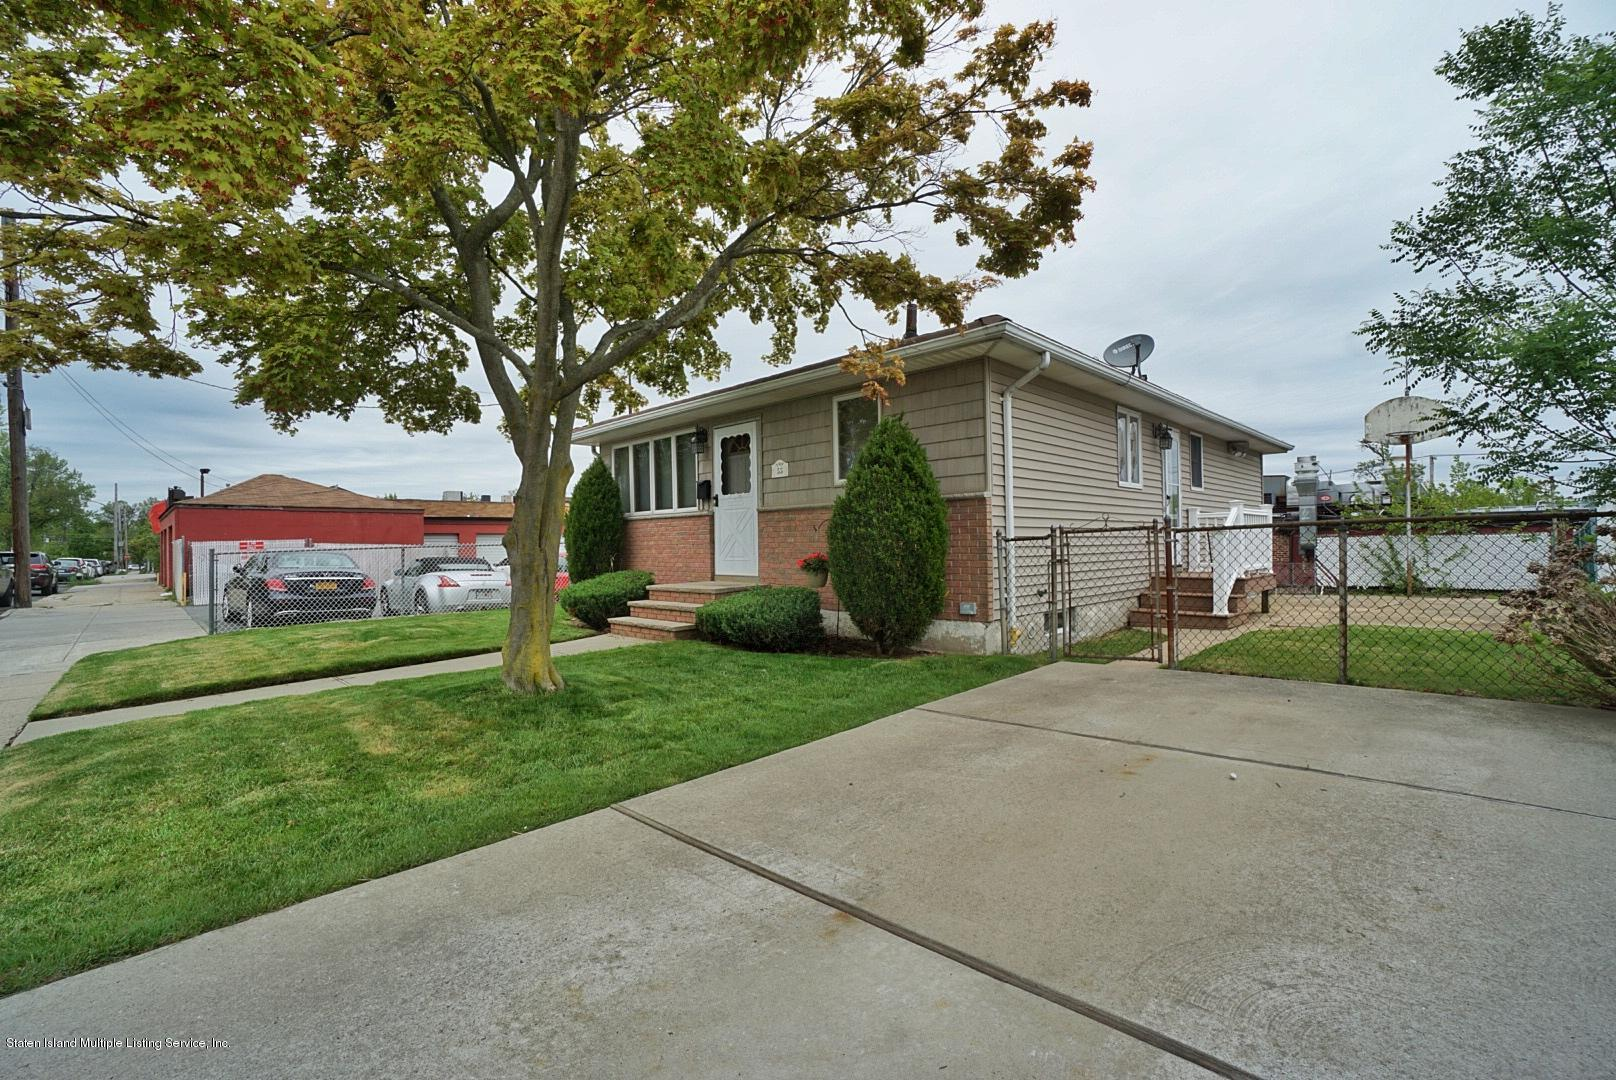 Single Family - Detached 55 Lyndale Avenue  Staten Island, NY 10312, MLS-1128769-2